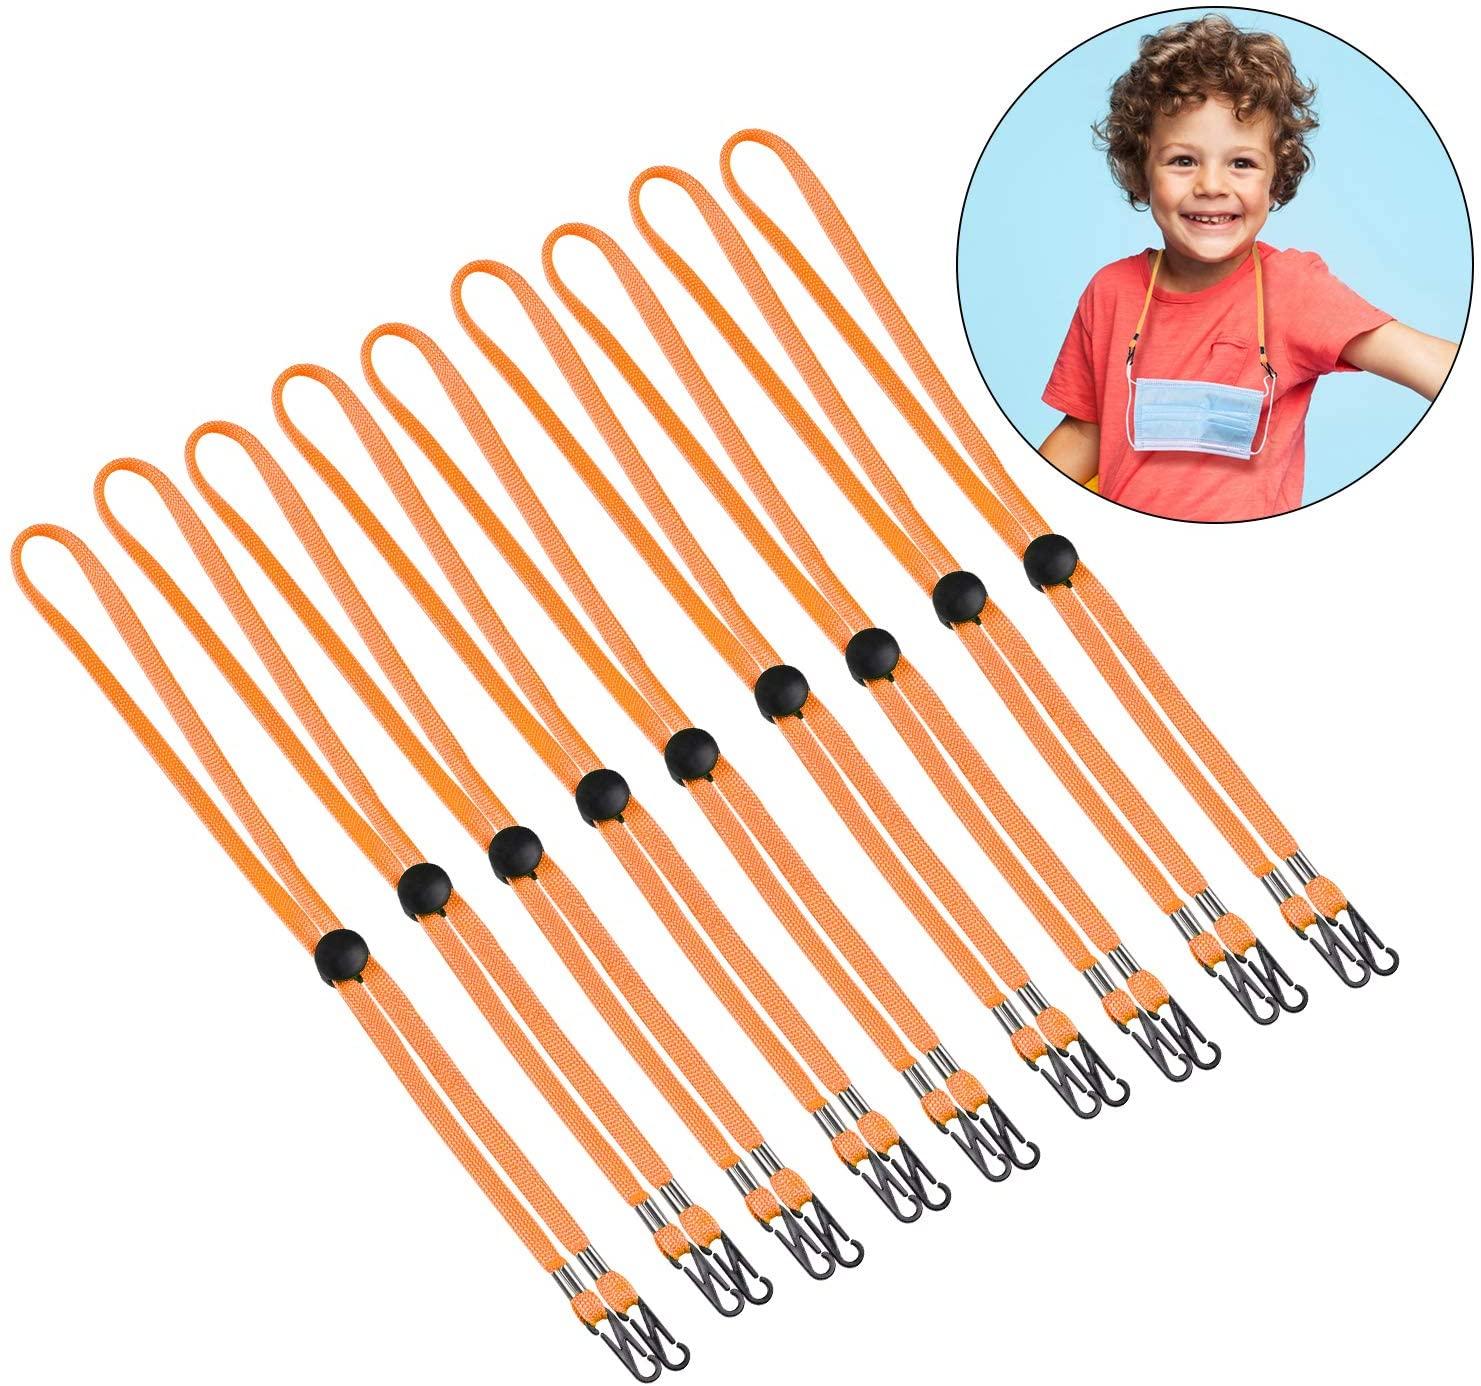 SfAVEreak 100 Pack Mask Lanyard for Kids, Double Clip Lanyard for Kids/Lanyard for Mask for Kids/Kids Lanyards for School - Orange